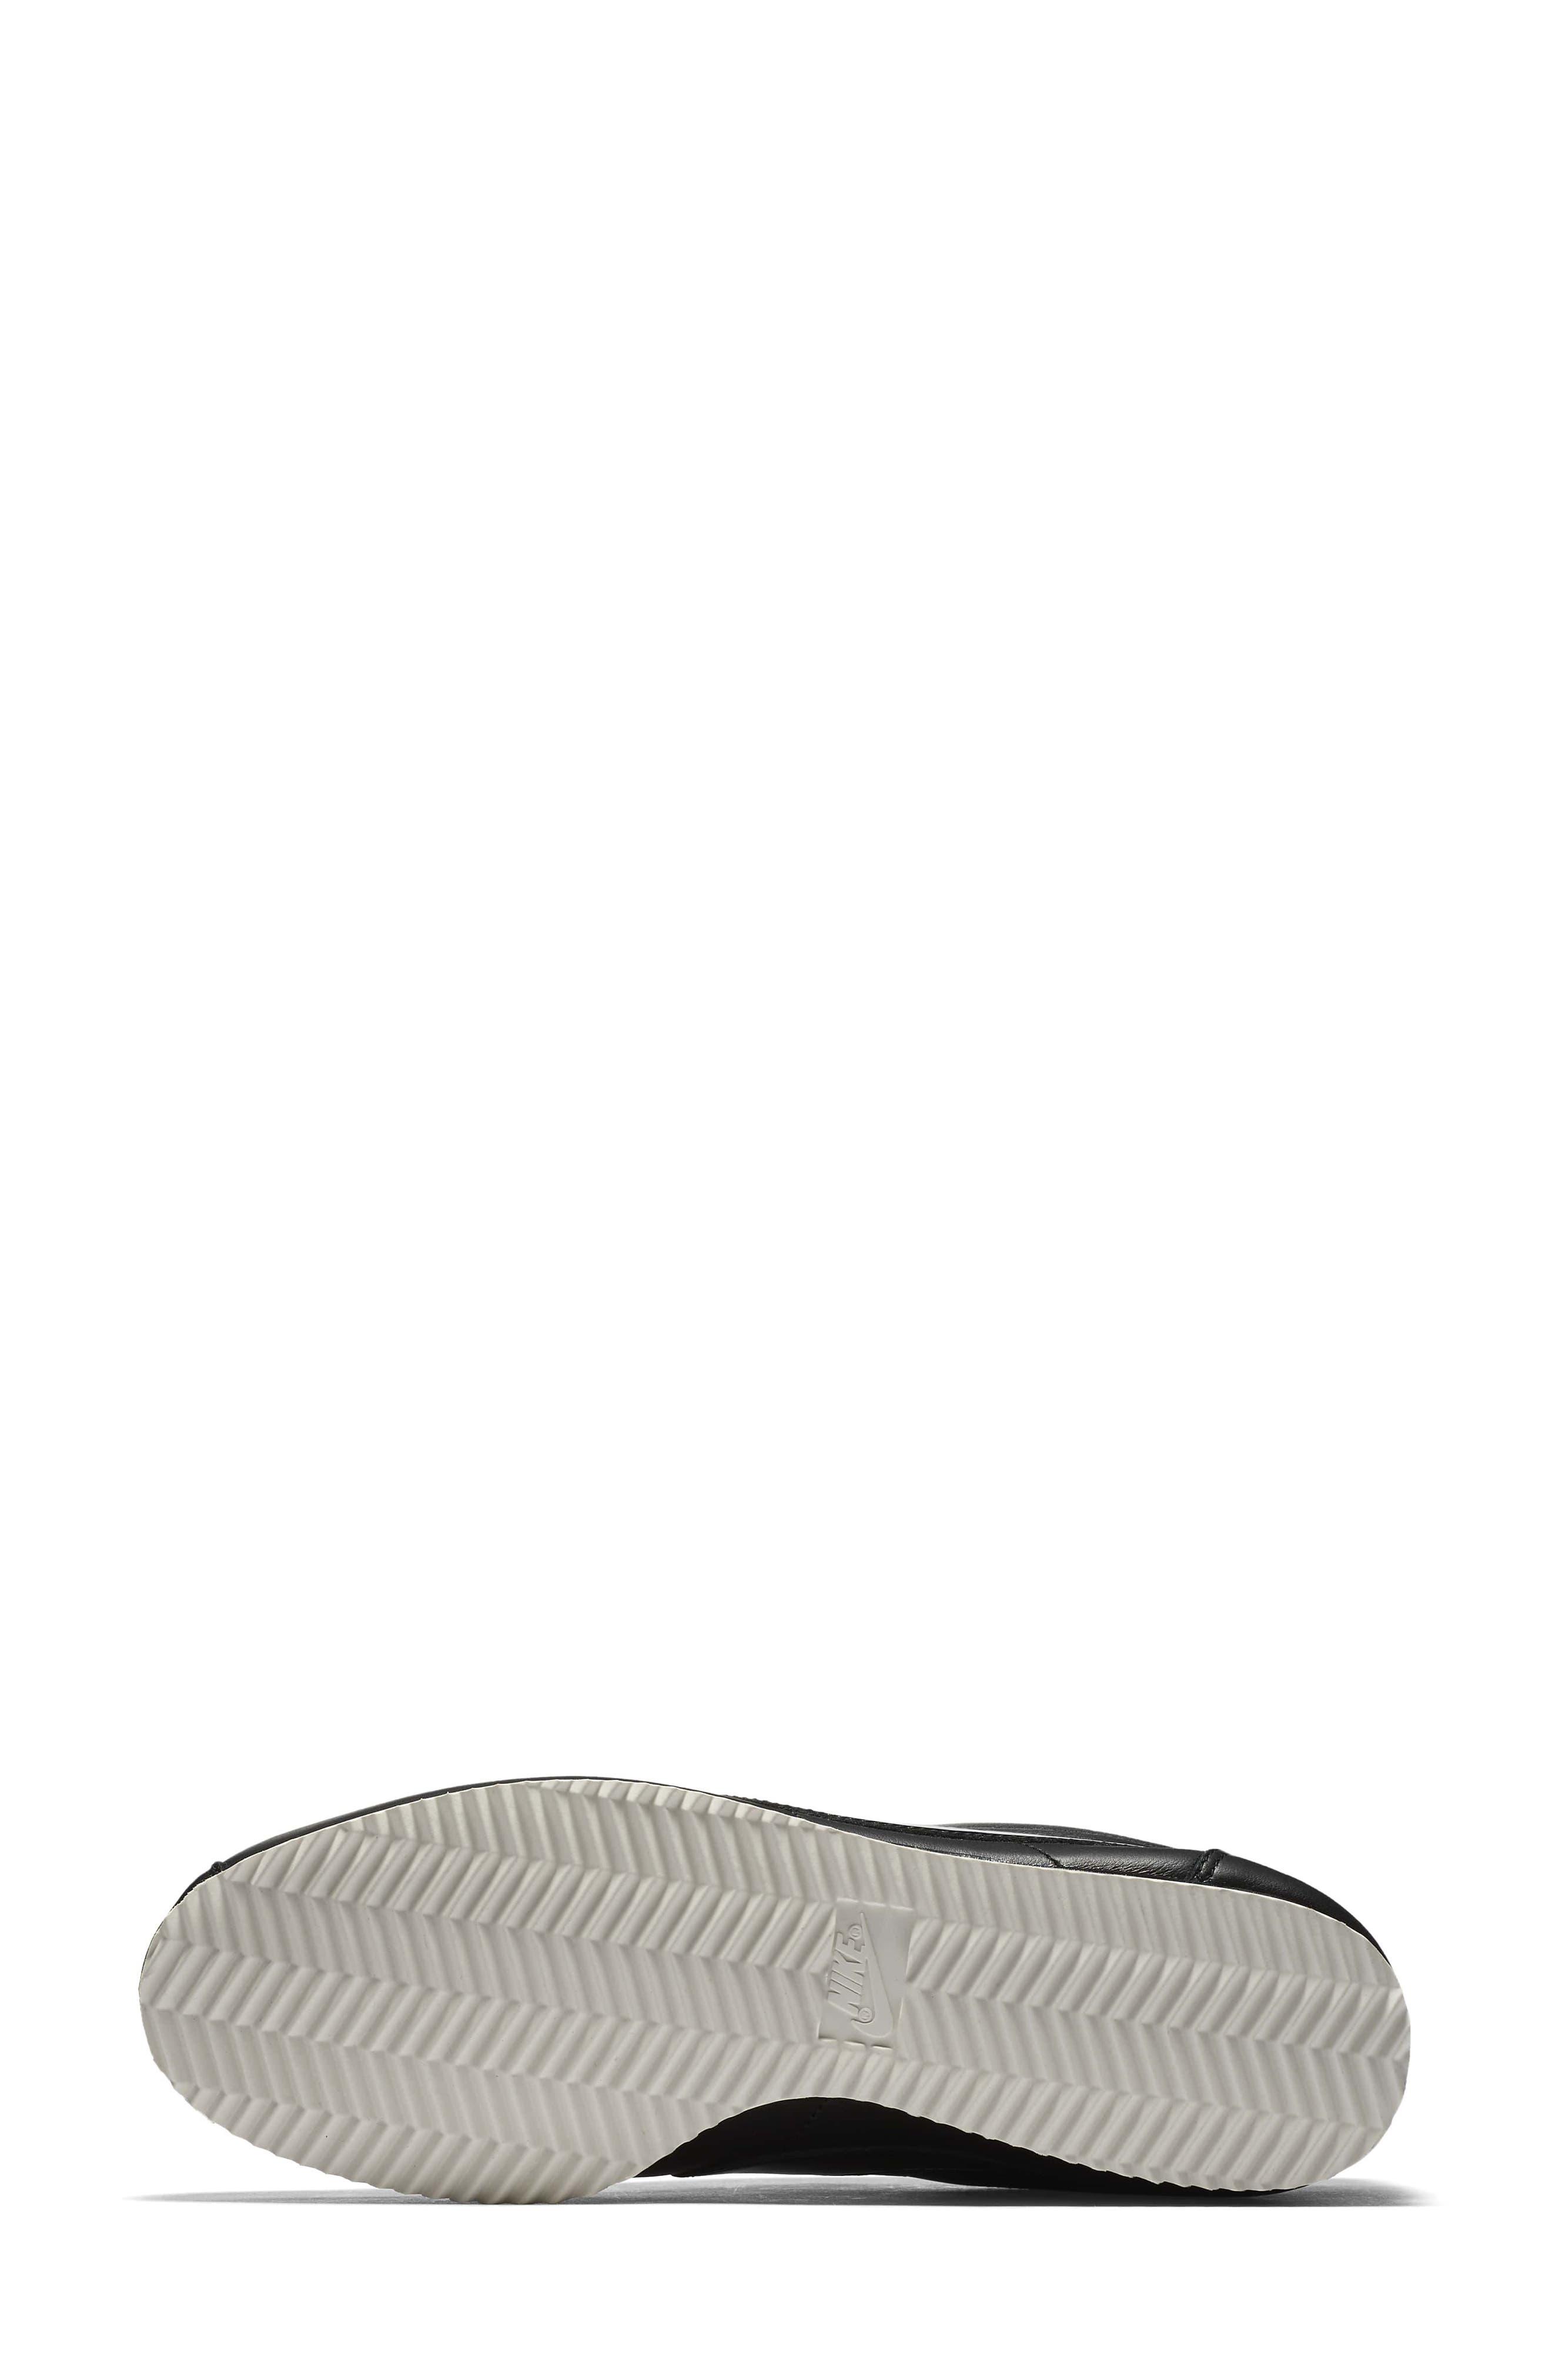 Classic Cortez SE Premium Sneaker,                             Alternate thumbnail 6, color,                             Black/ Black Reflect Silver